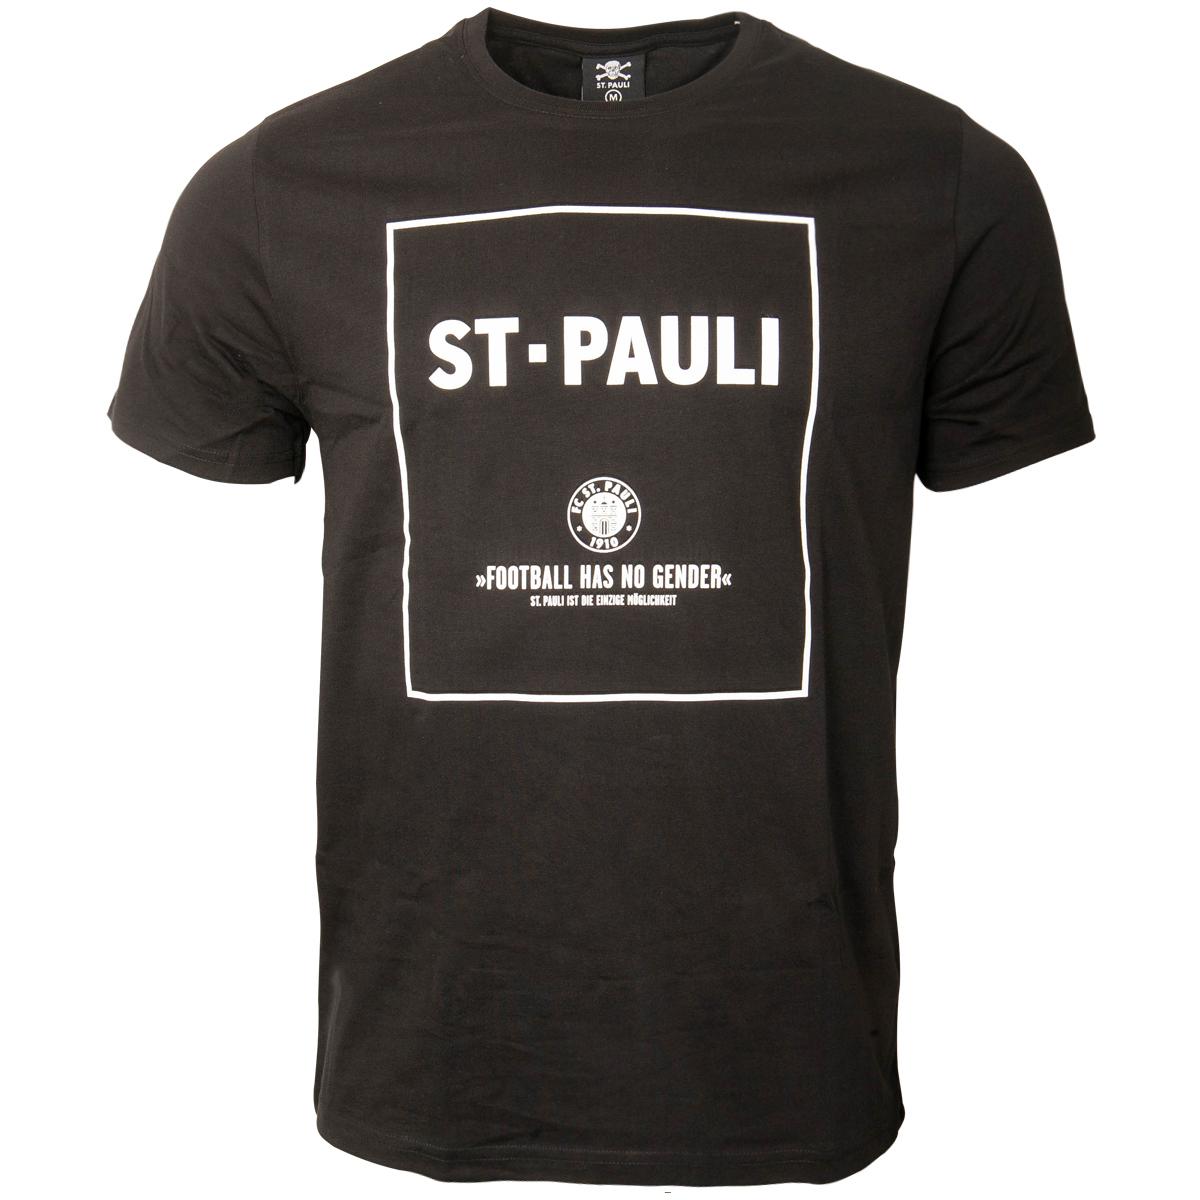 FC St. Pauli - T-Shirt No Gender - schwarz